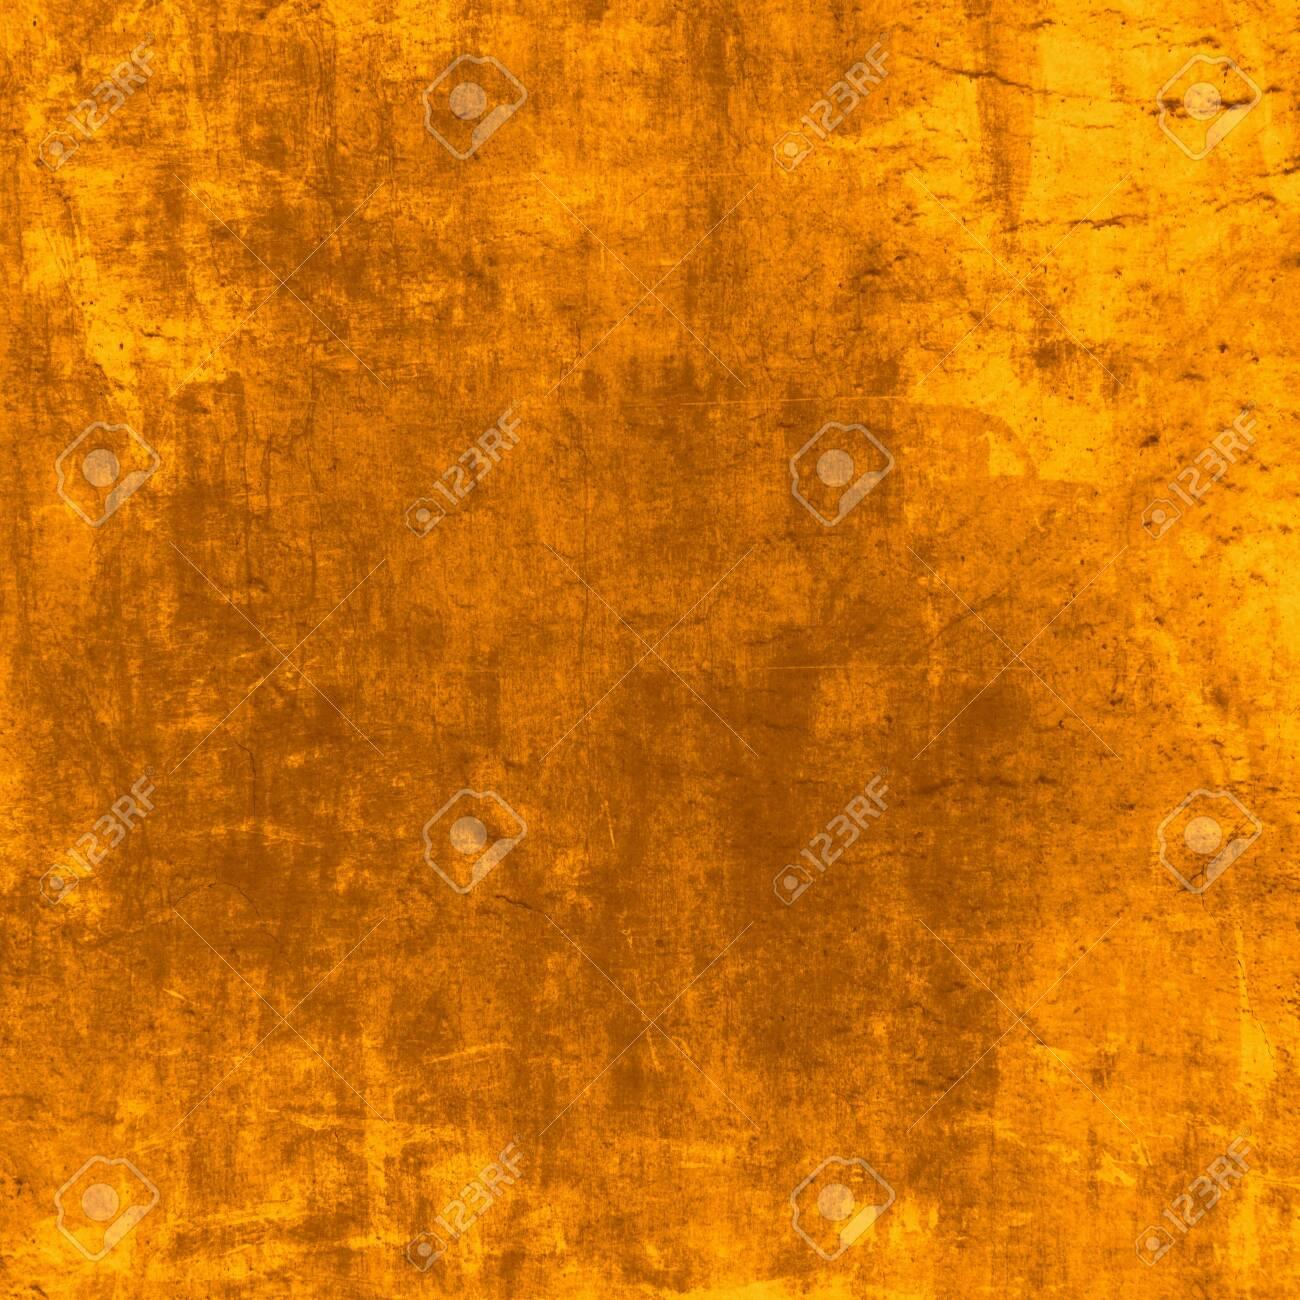 Abstract orange background texture - 144358338